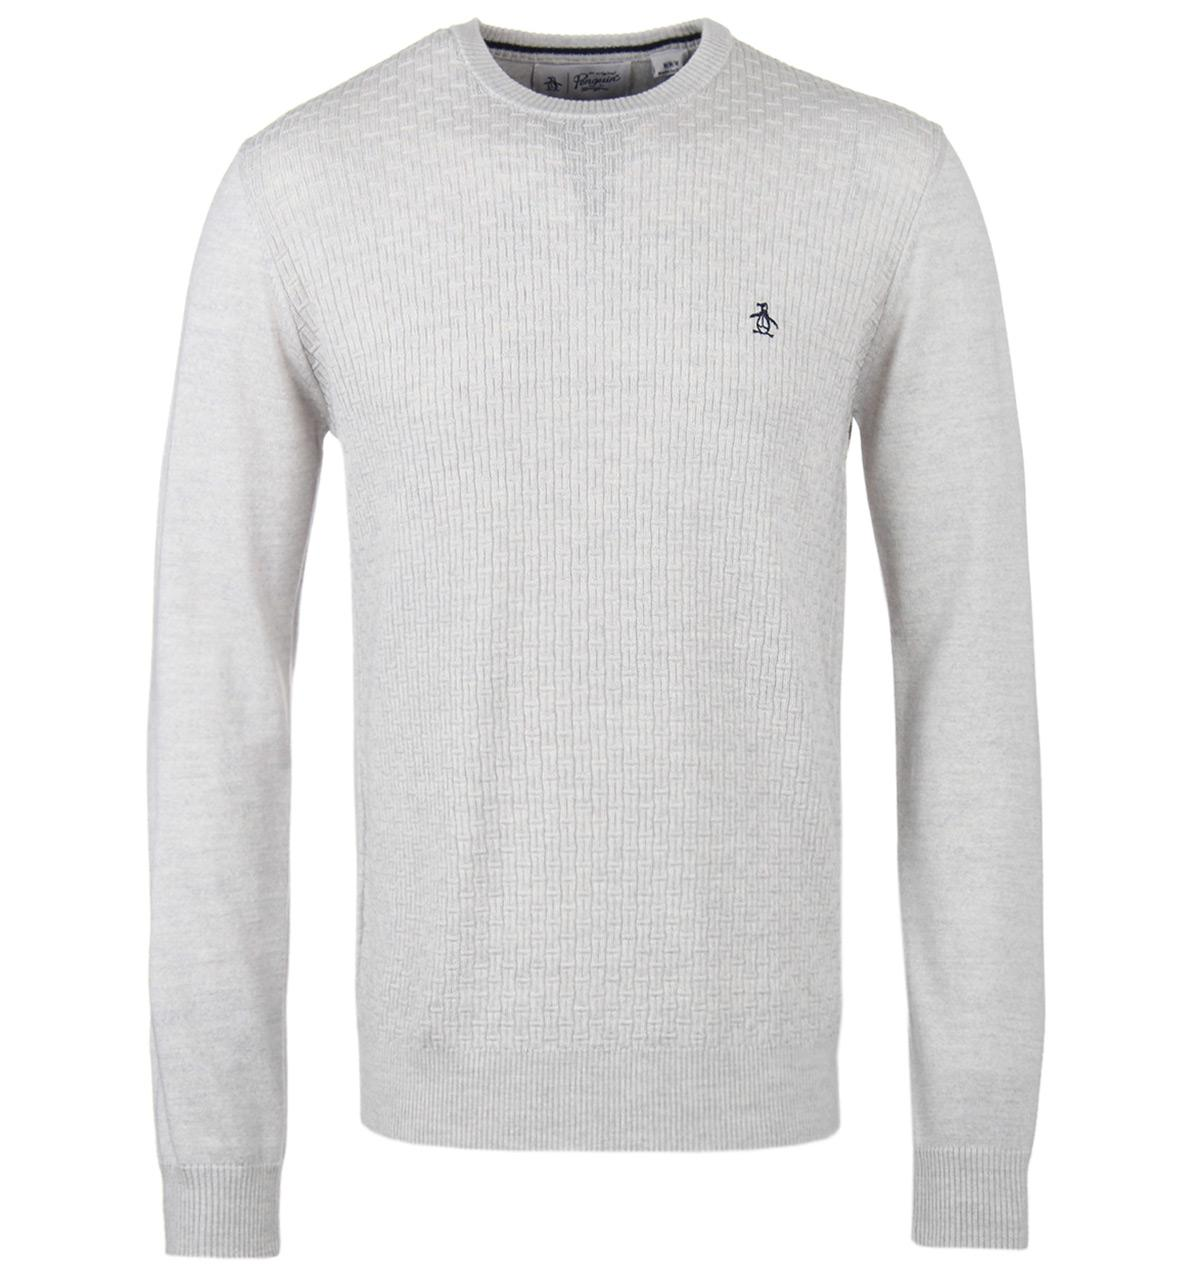 Original Penguin Rock Ridge Heather Basketweave Merino Wool Sweater in Grey for Men